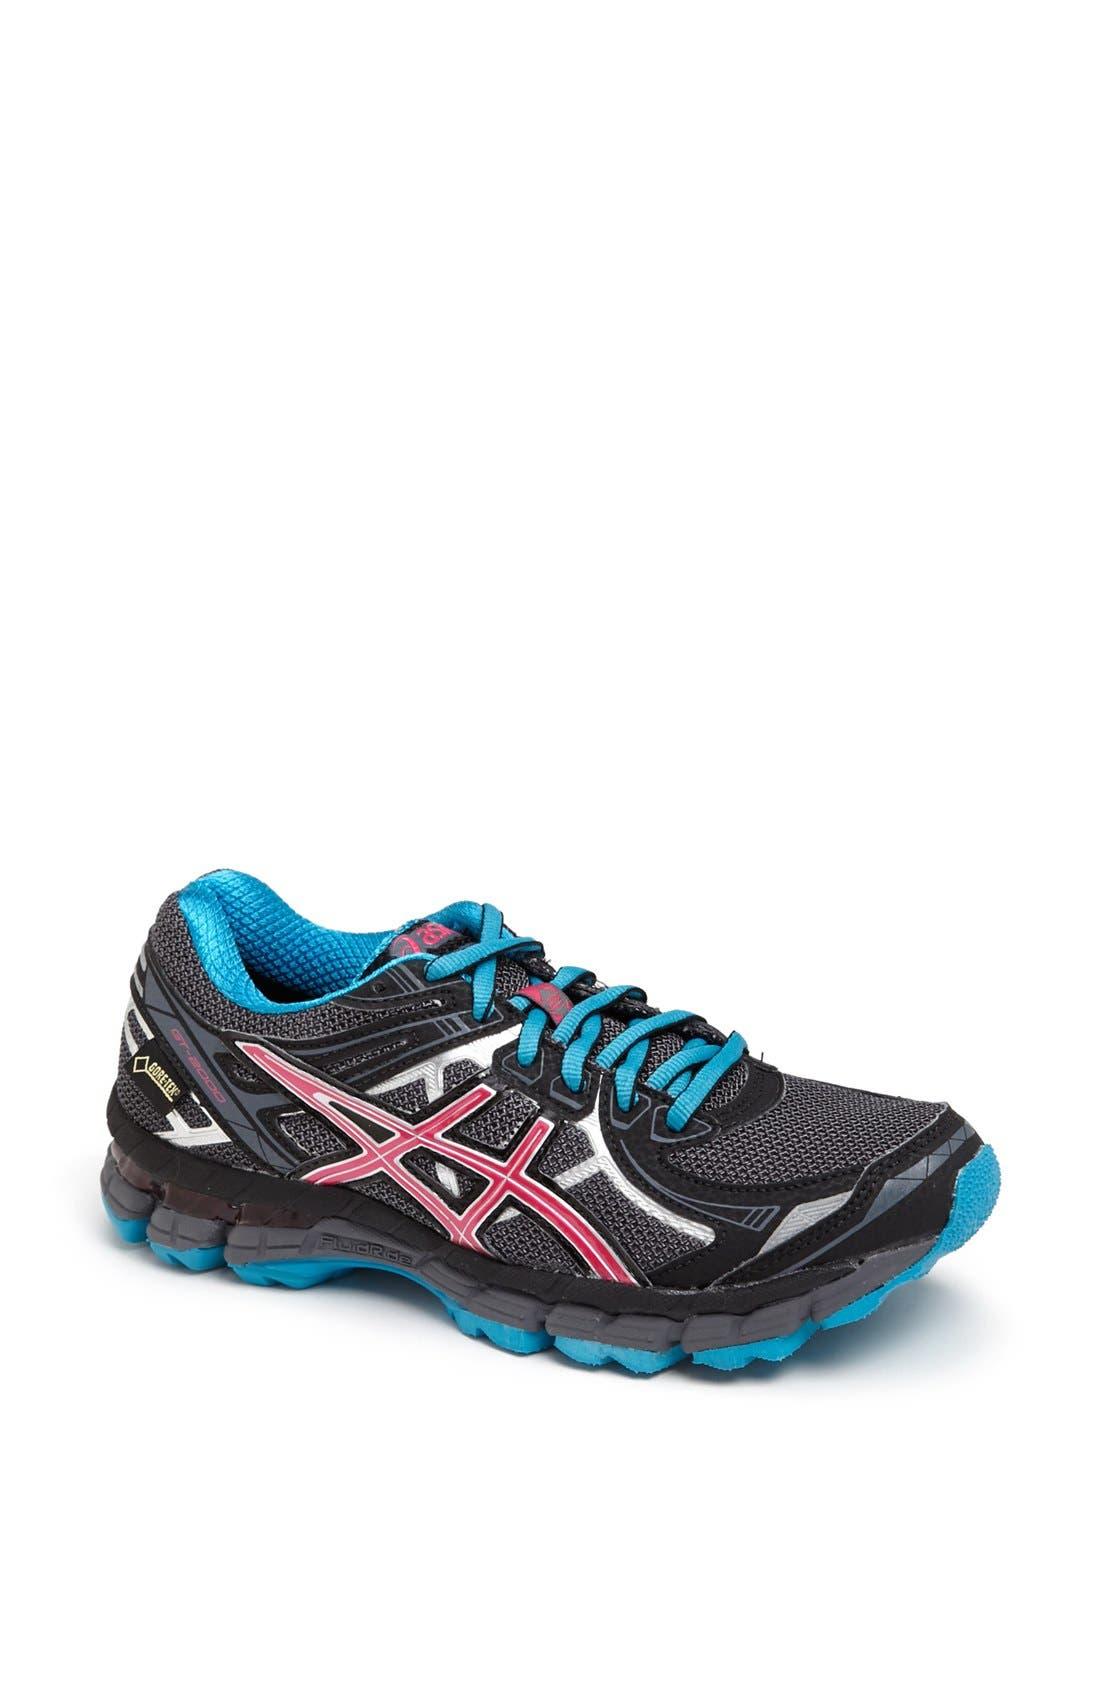 Main Image - ASICS® 'GT-2000™ G-TX' Waterproof Running Shoe (Women)